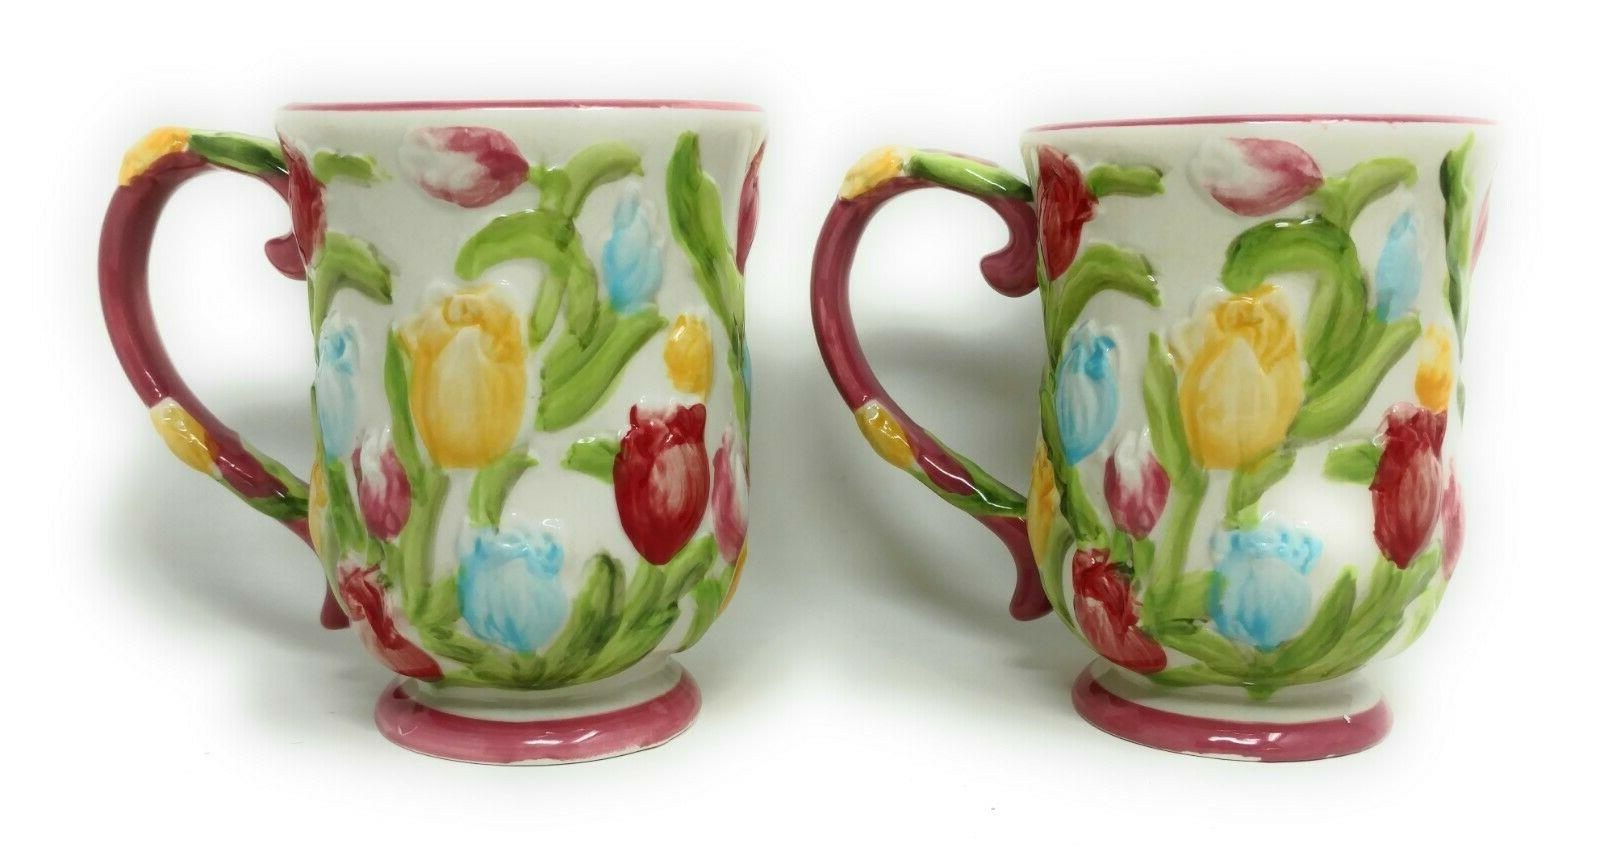 temp tations s 2 figural floral dinnerware